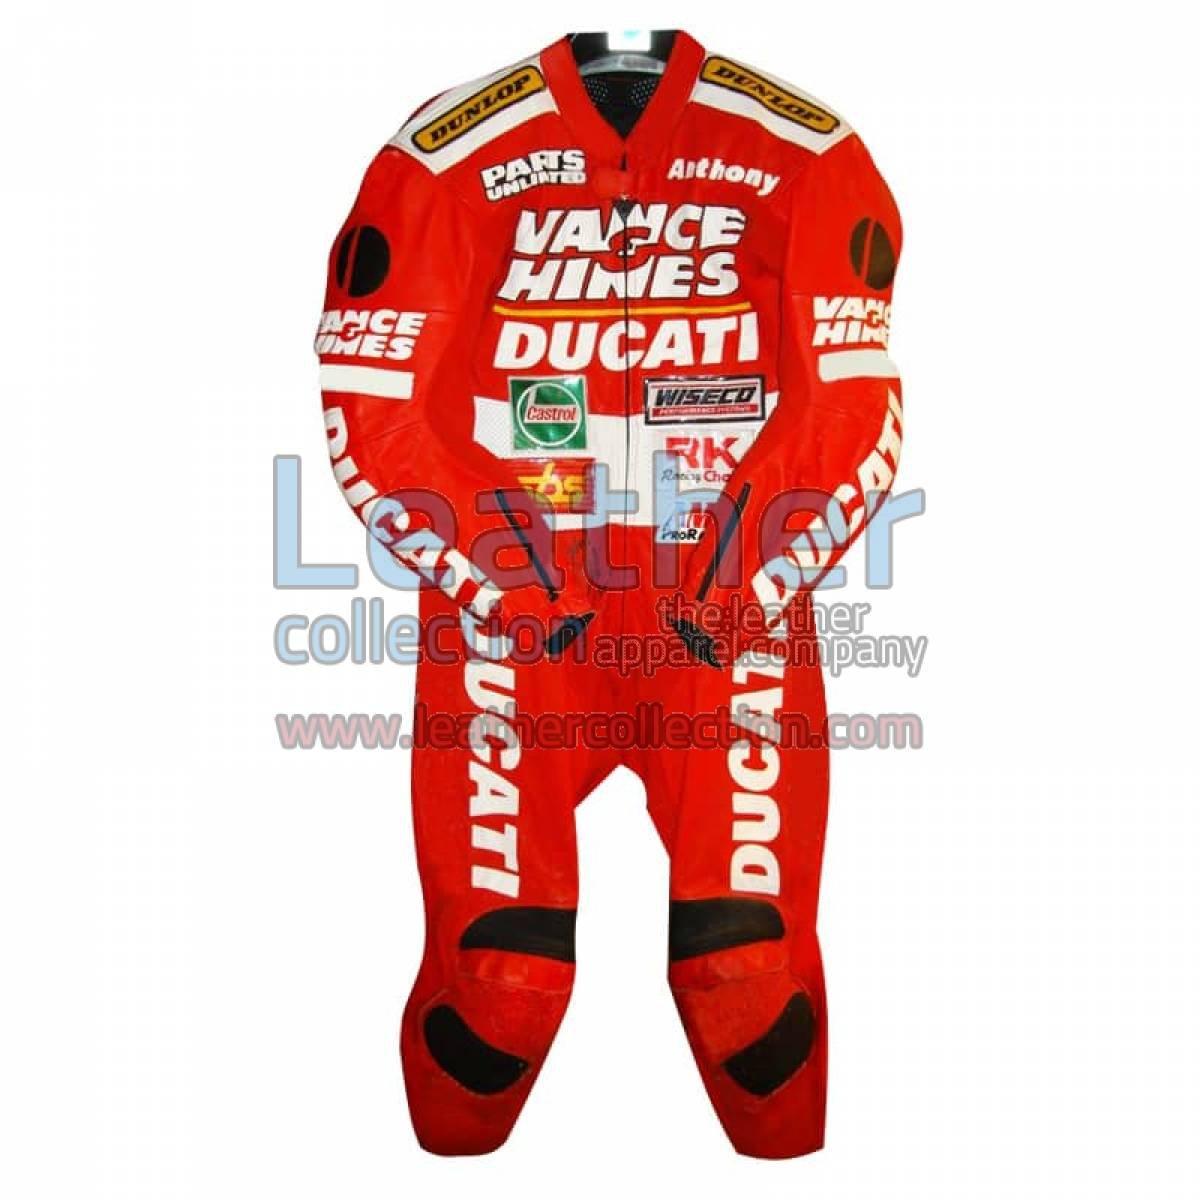 Anthony Gobert Vance & Hines Ducati Leathers 1998 - 1999 AMA